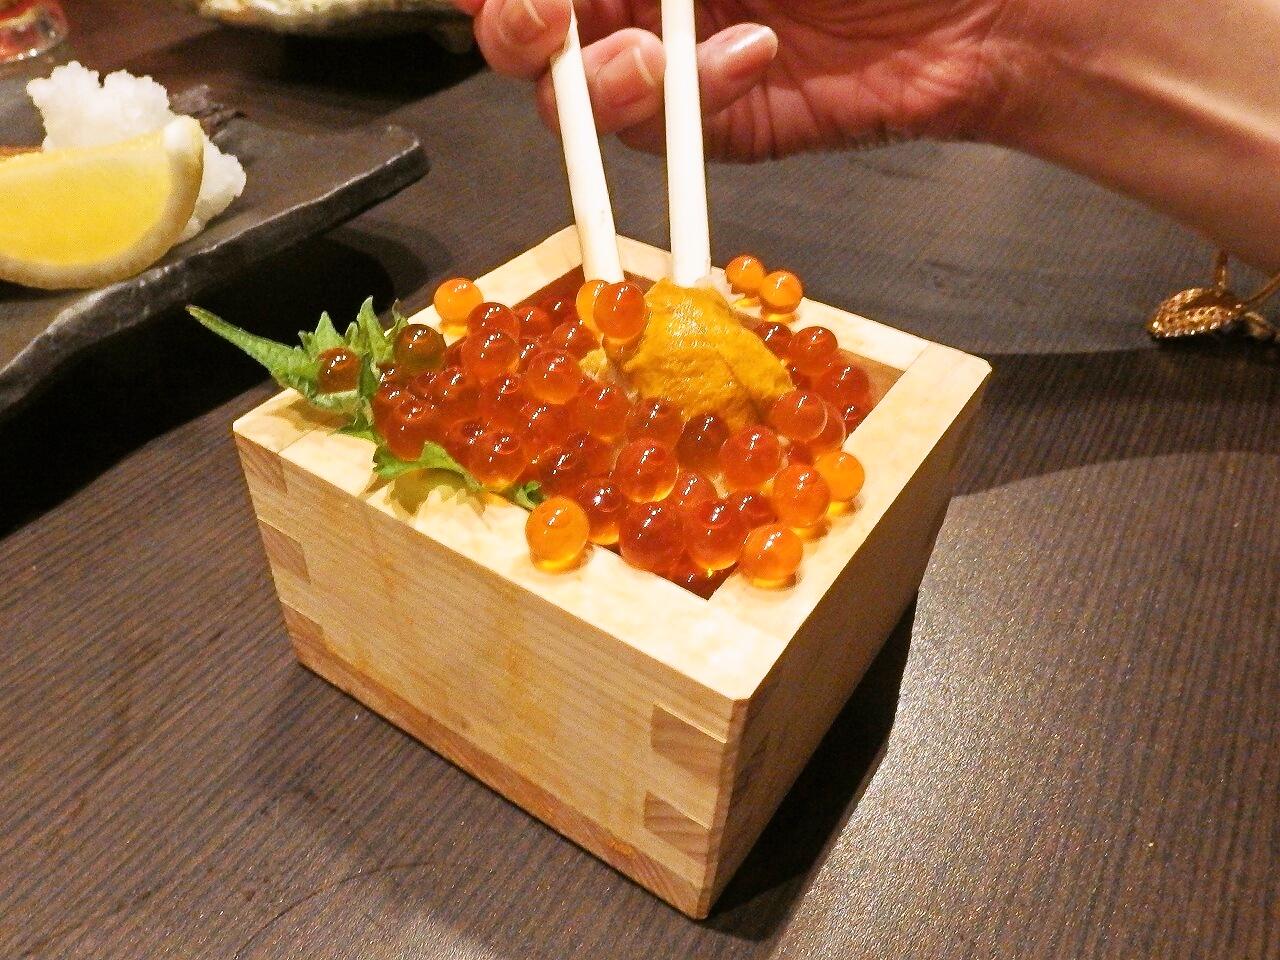 foodpic7527225.jpg